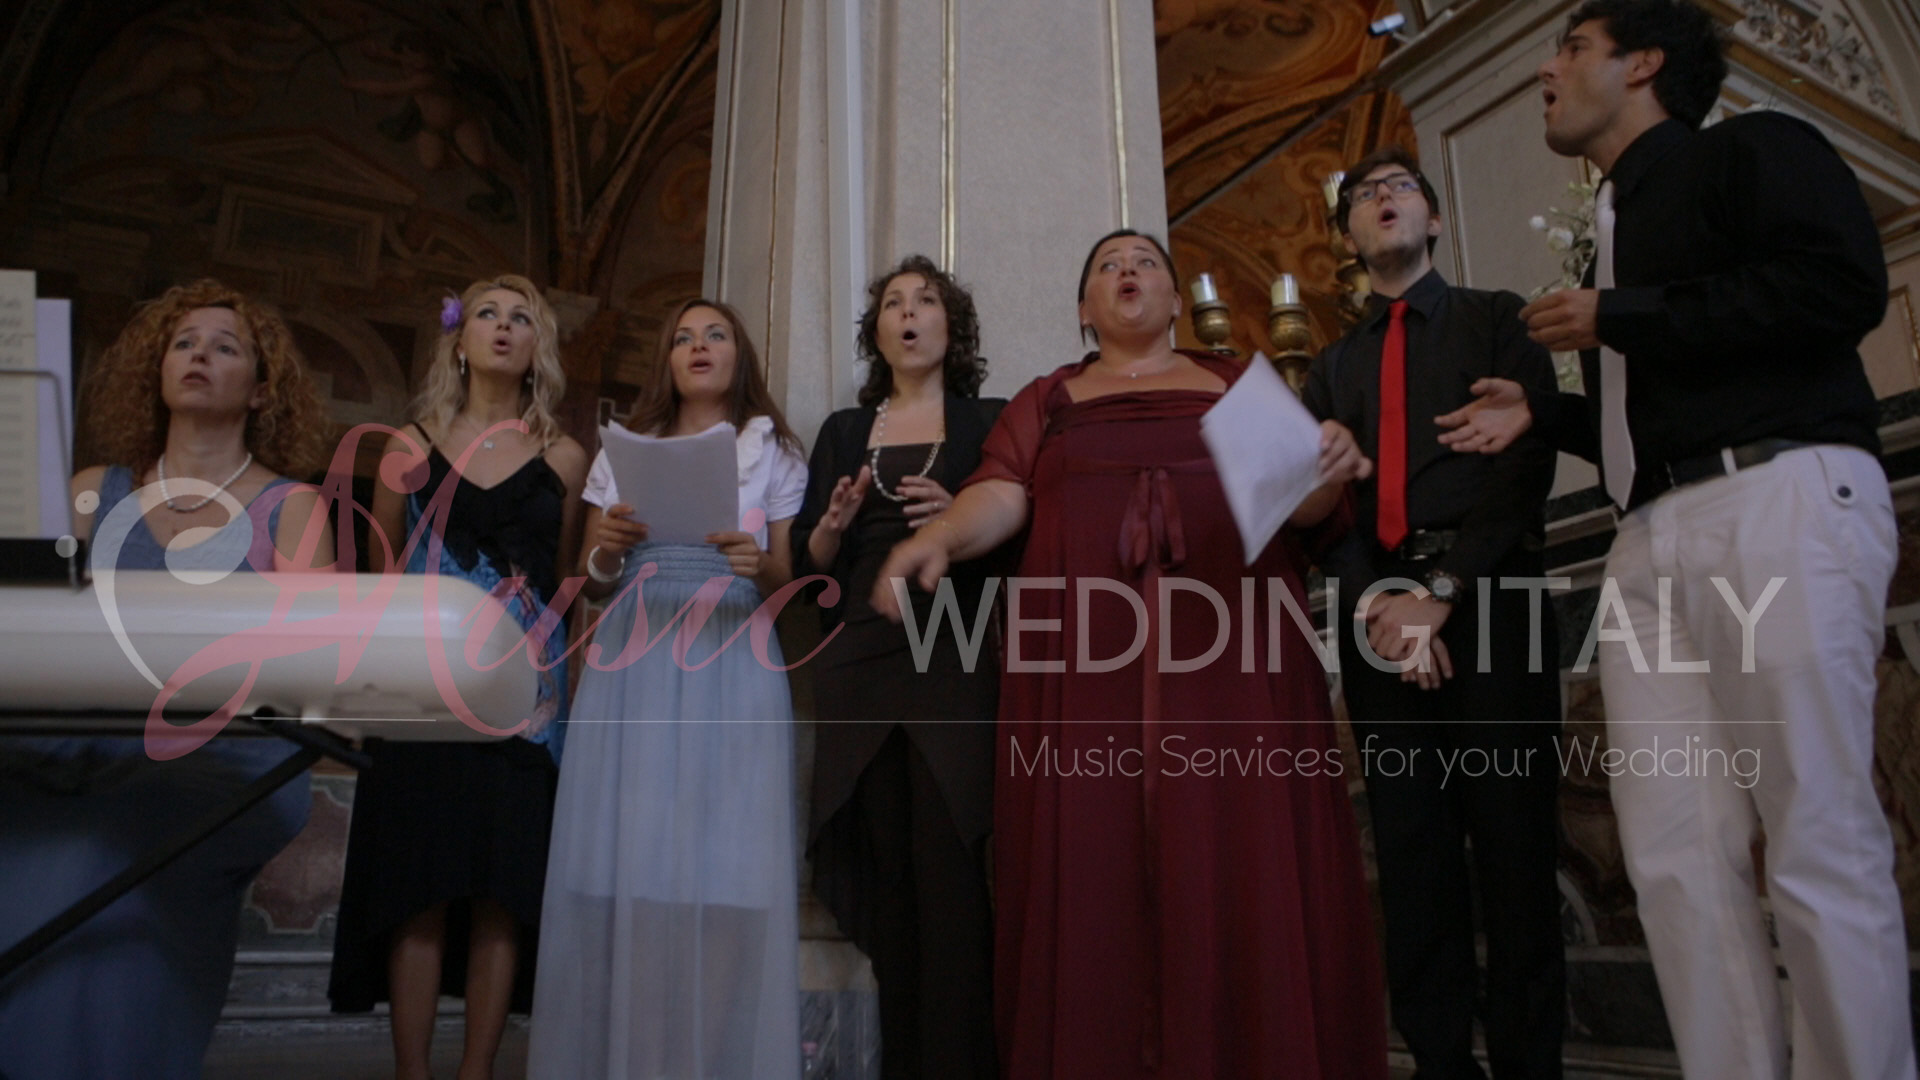 coro gospel music wedding italy wedding music italy